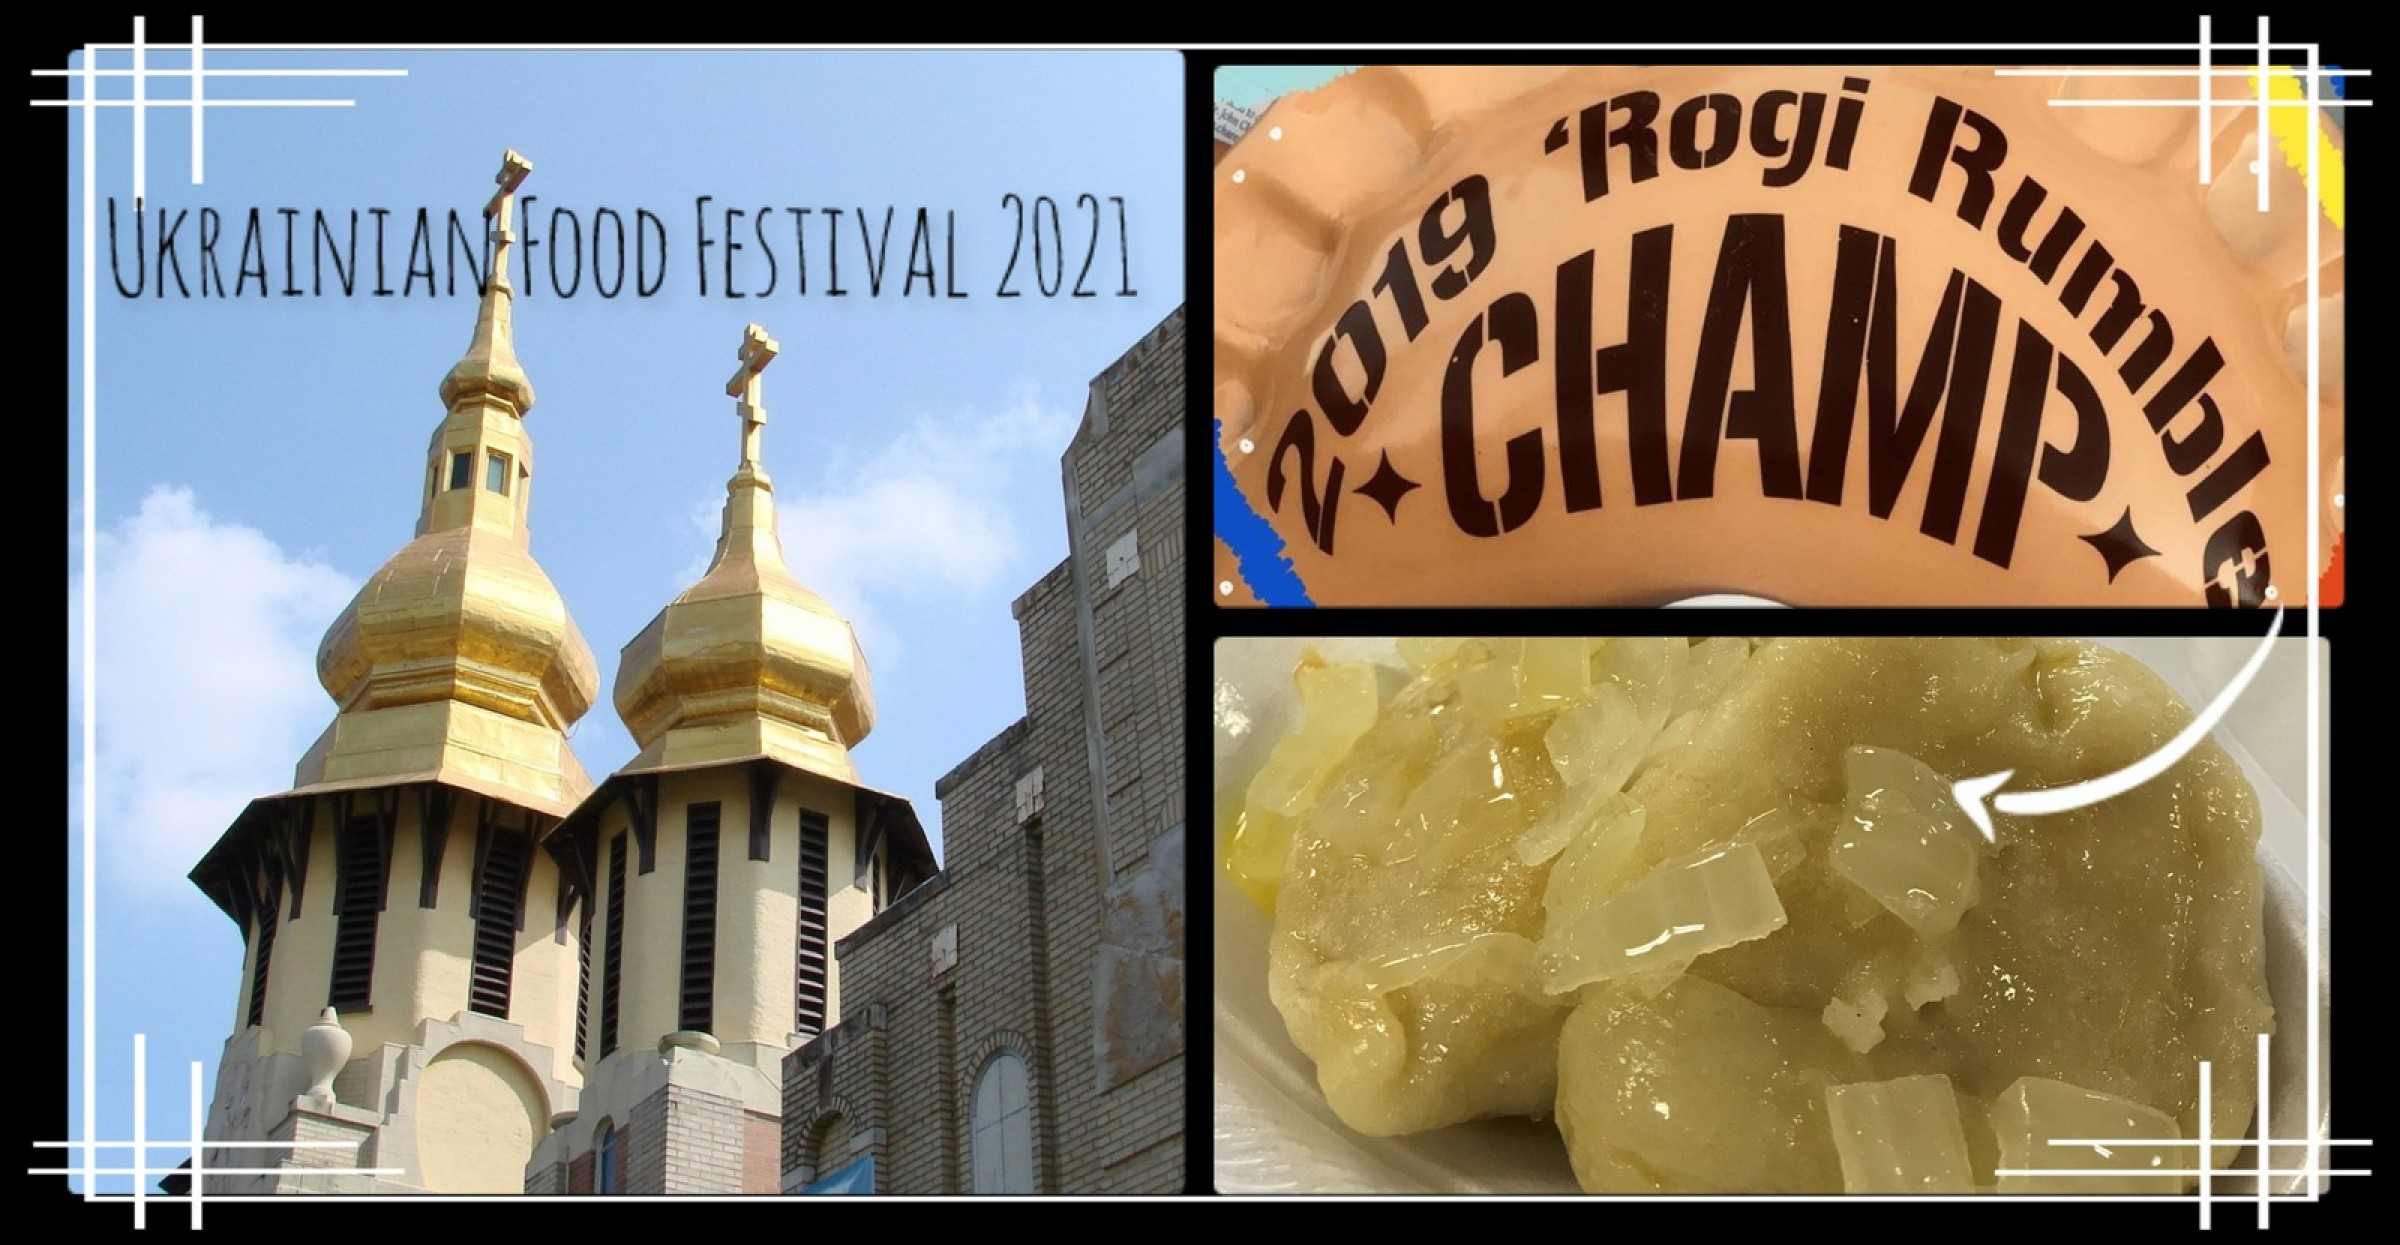 2021 UKRAINIAN FOOD FESTIVAL